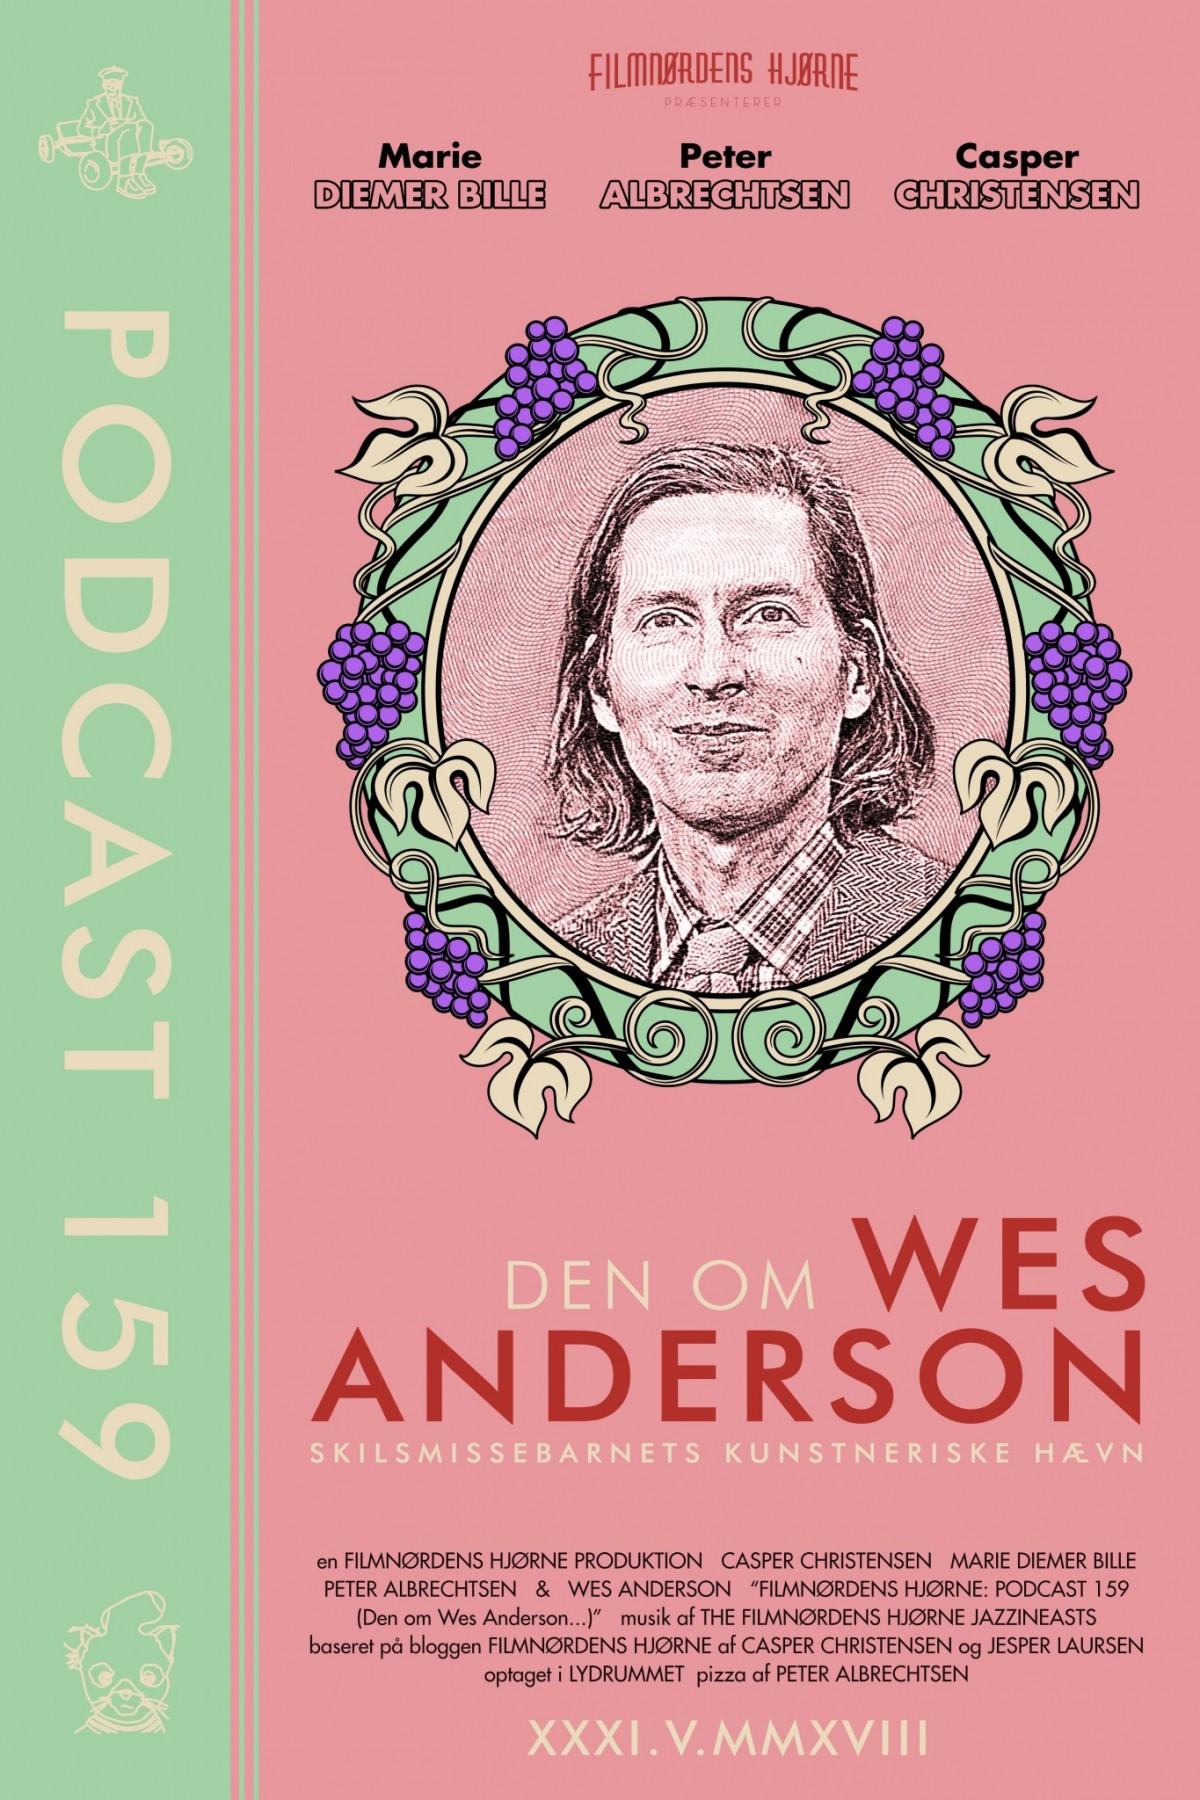 Podcast 159